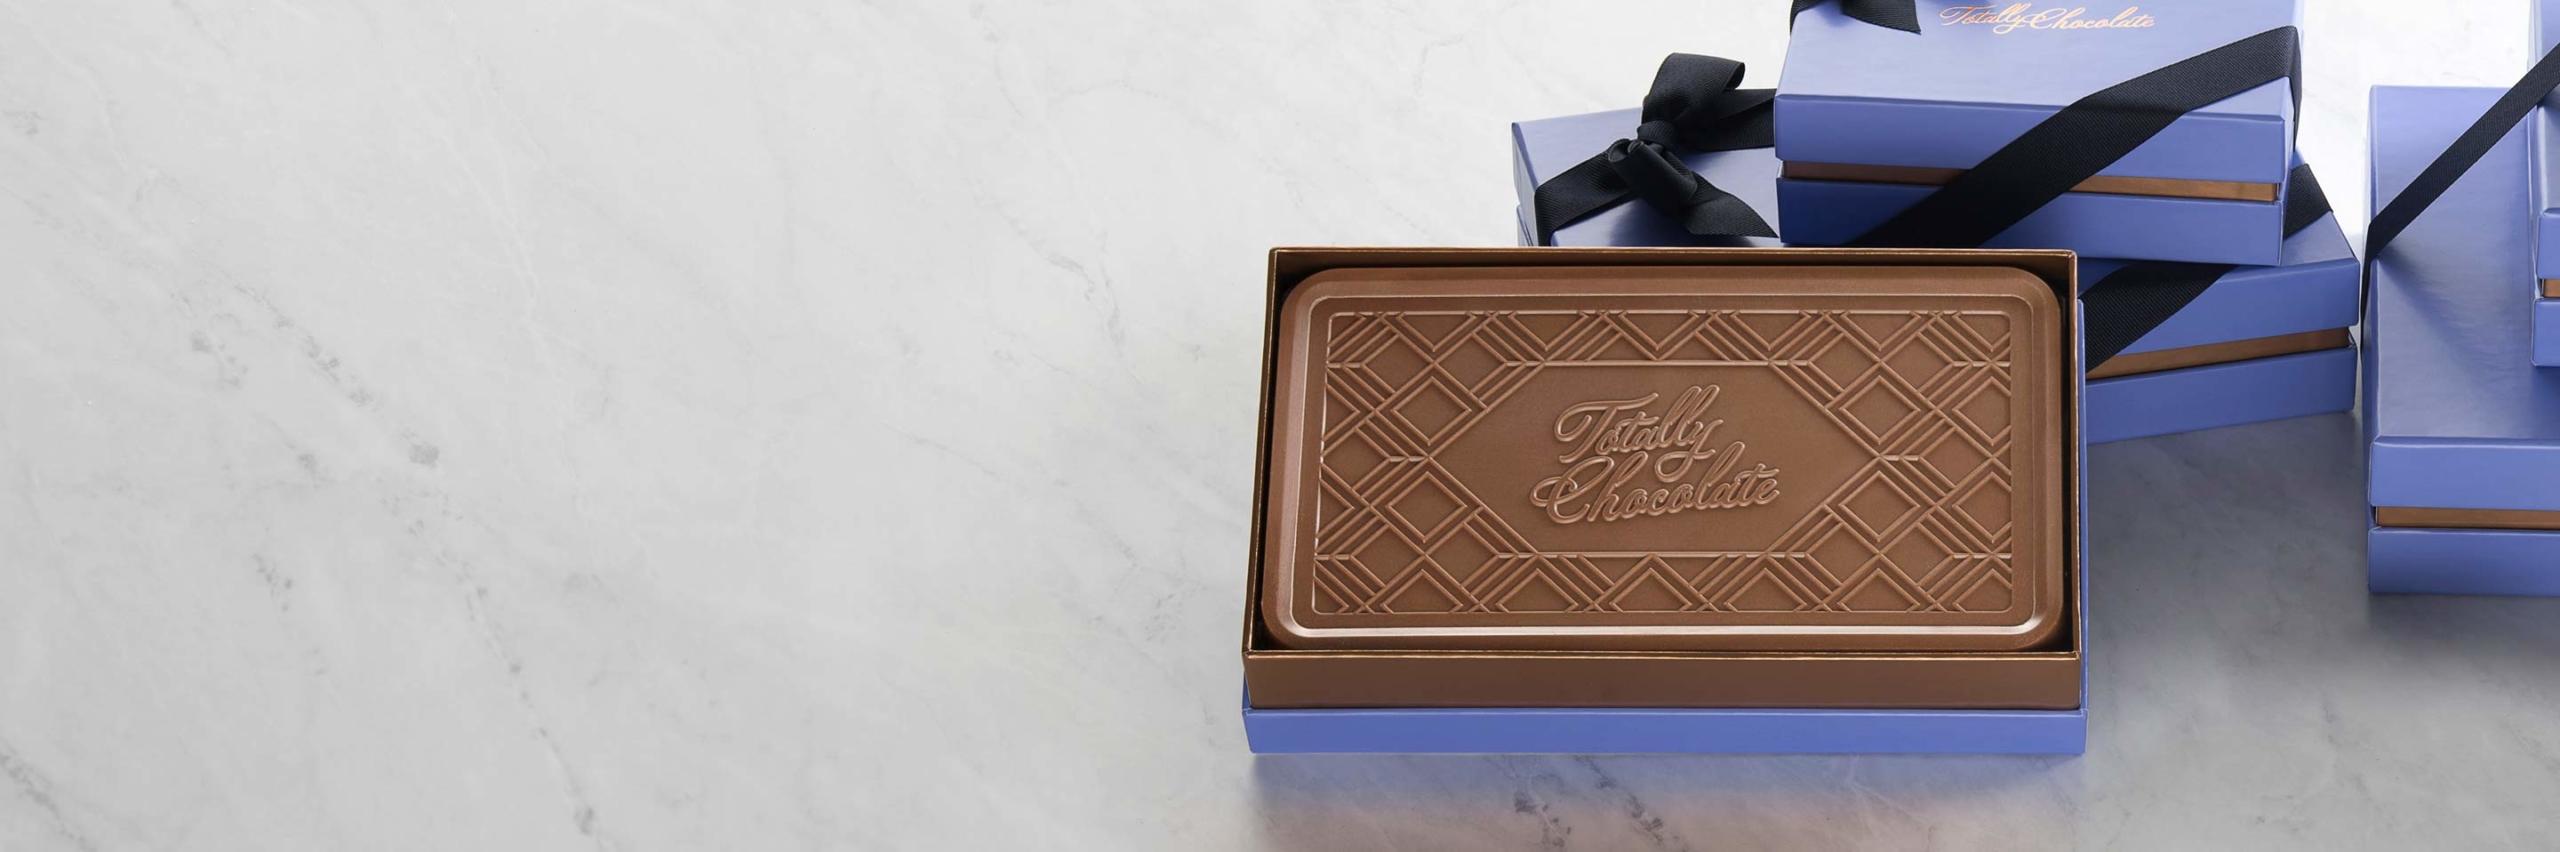 Chocolate-Specialists